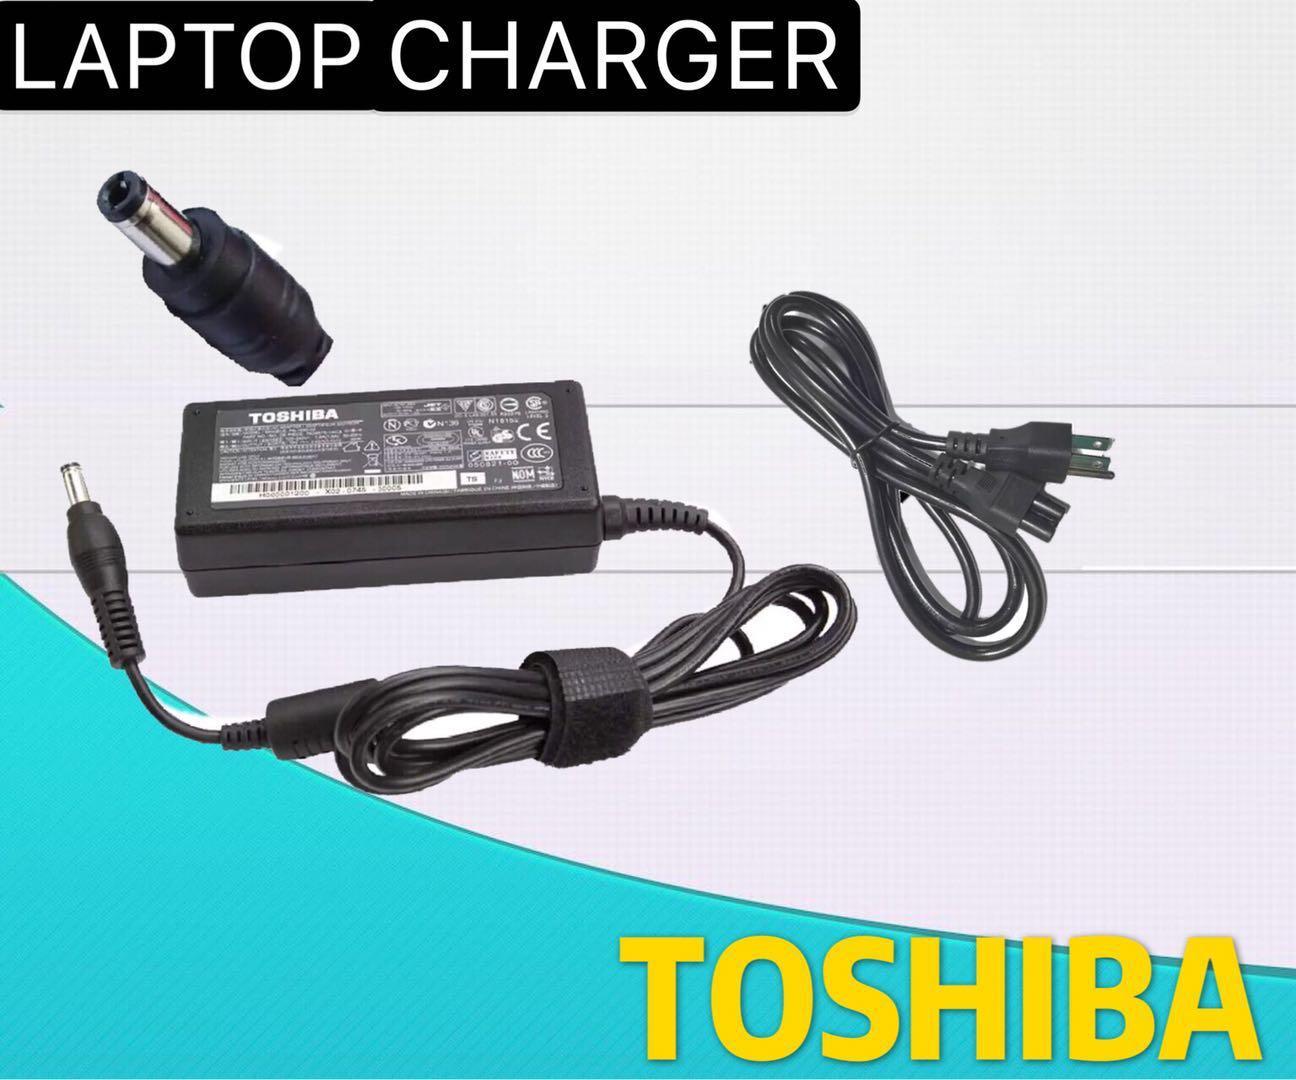 Buy Sell Cheapest Starmall Dsstyle C600 Best Quality Product Deals Keyboard Toshiba C640 L640 L635 L645 L735 L745 Series Laptop Charger Adapter For Satelite L600 L640d L645d L730 L300 L500